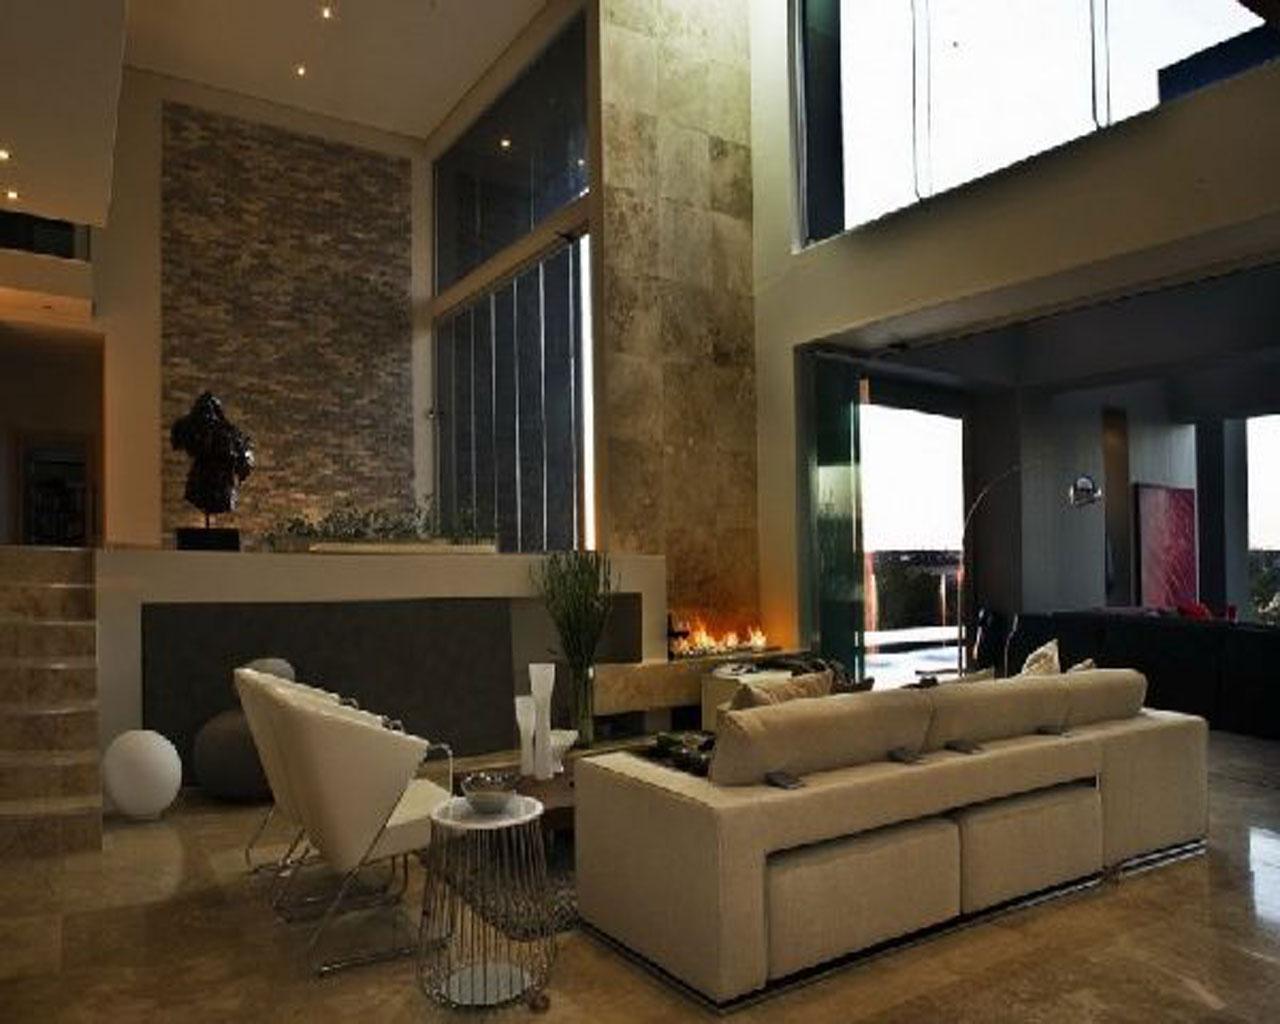 Modern Home Design Ideas Dream House Experience - Contemporary modern home designs